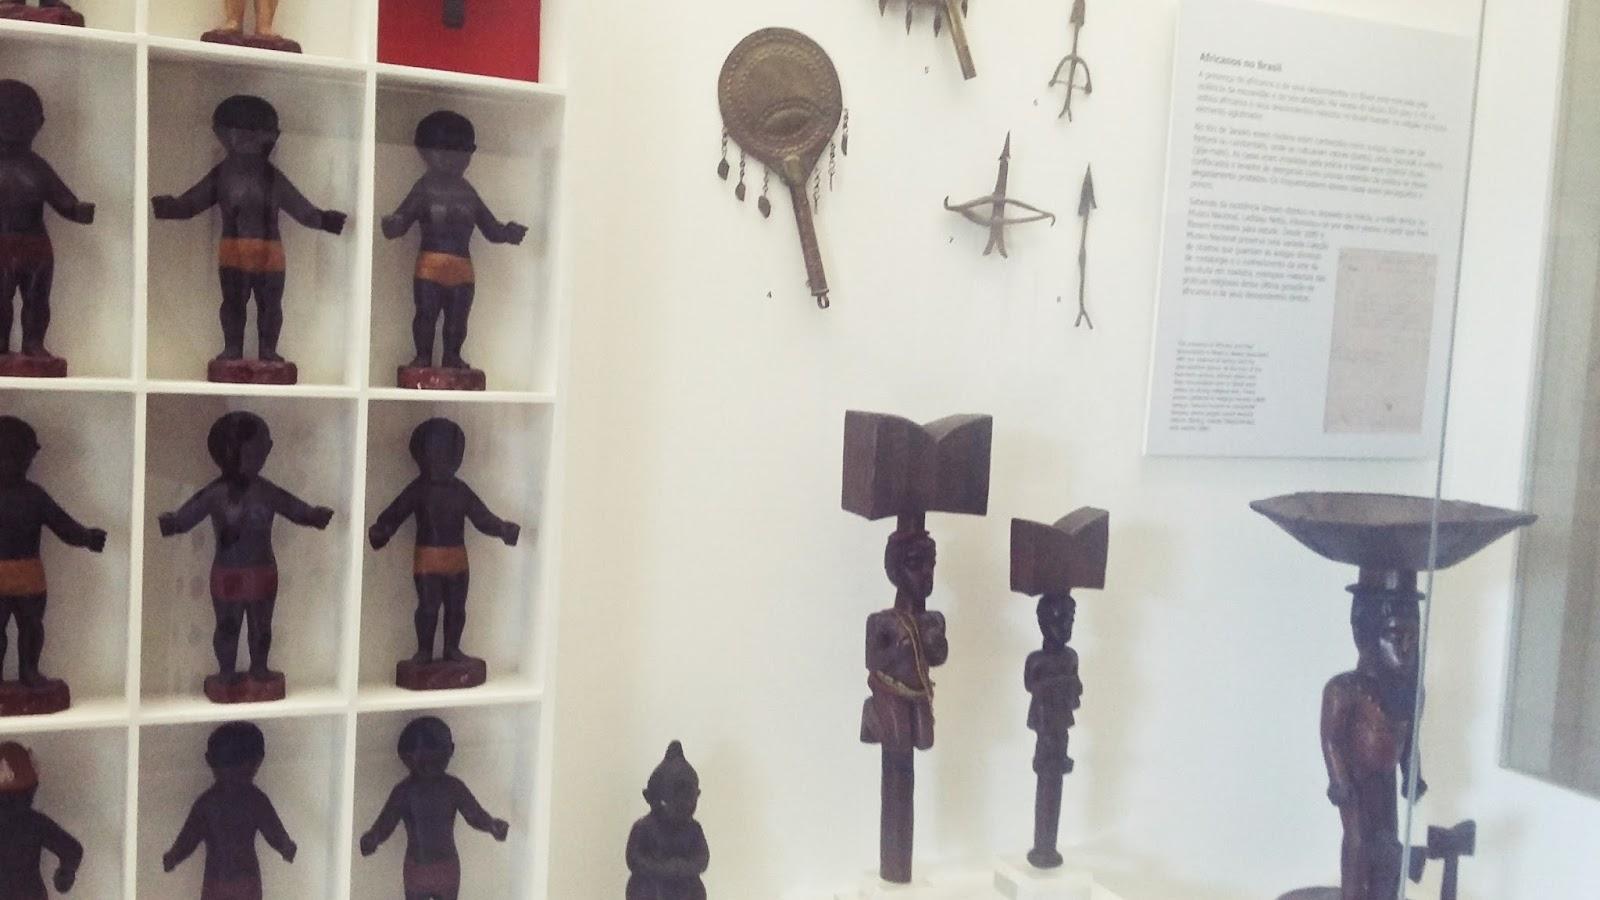 Museu Nacional - Quinta da Boa Vista/RJ